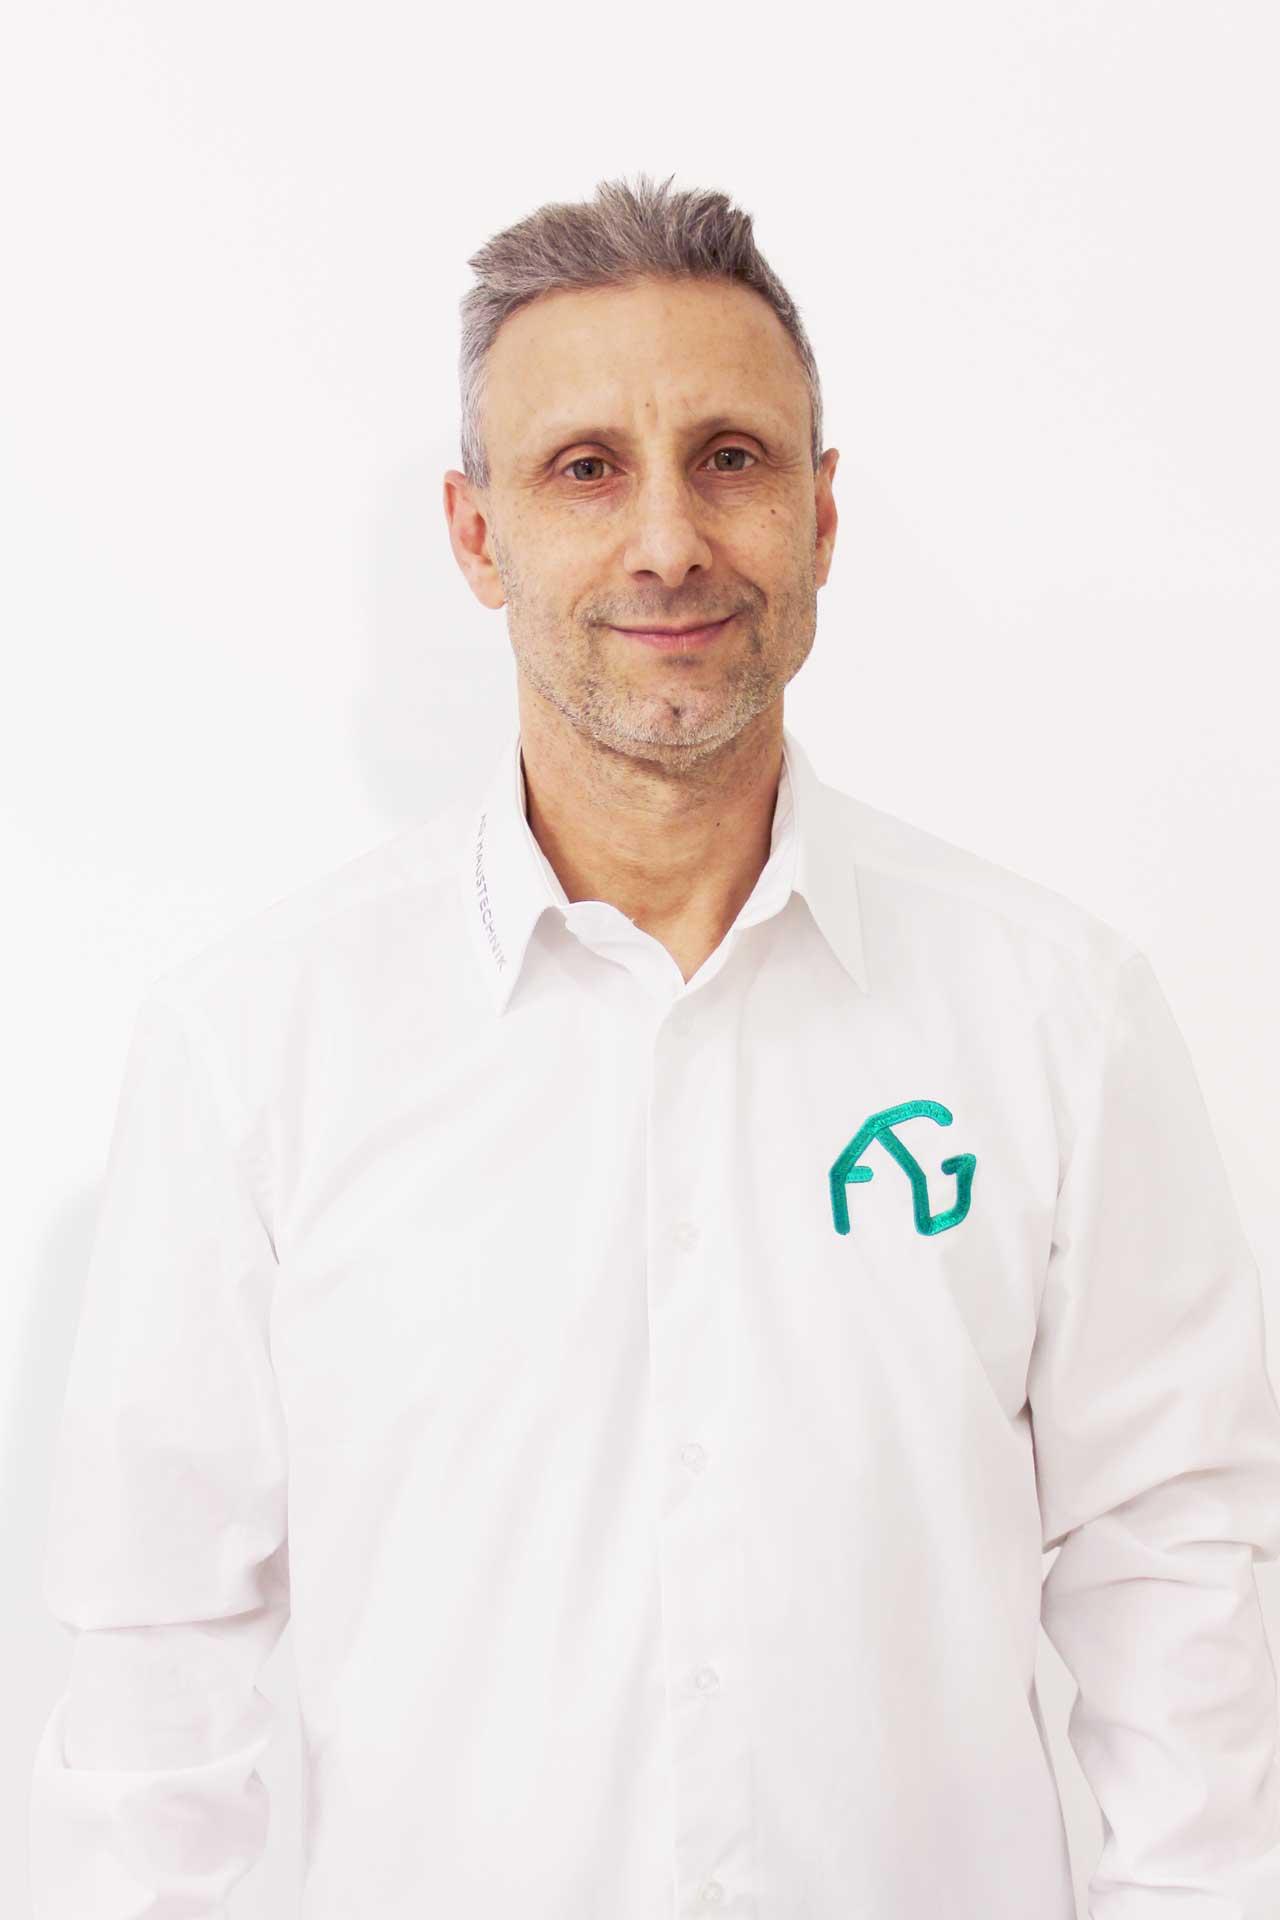 Antonio Spica